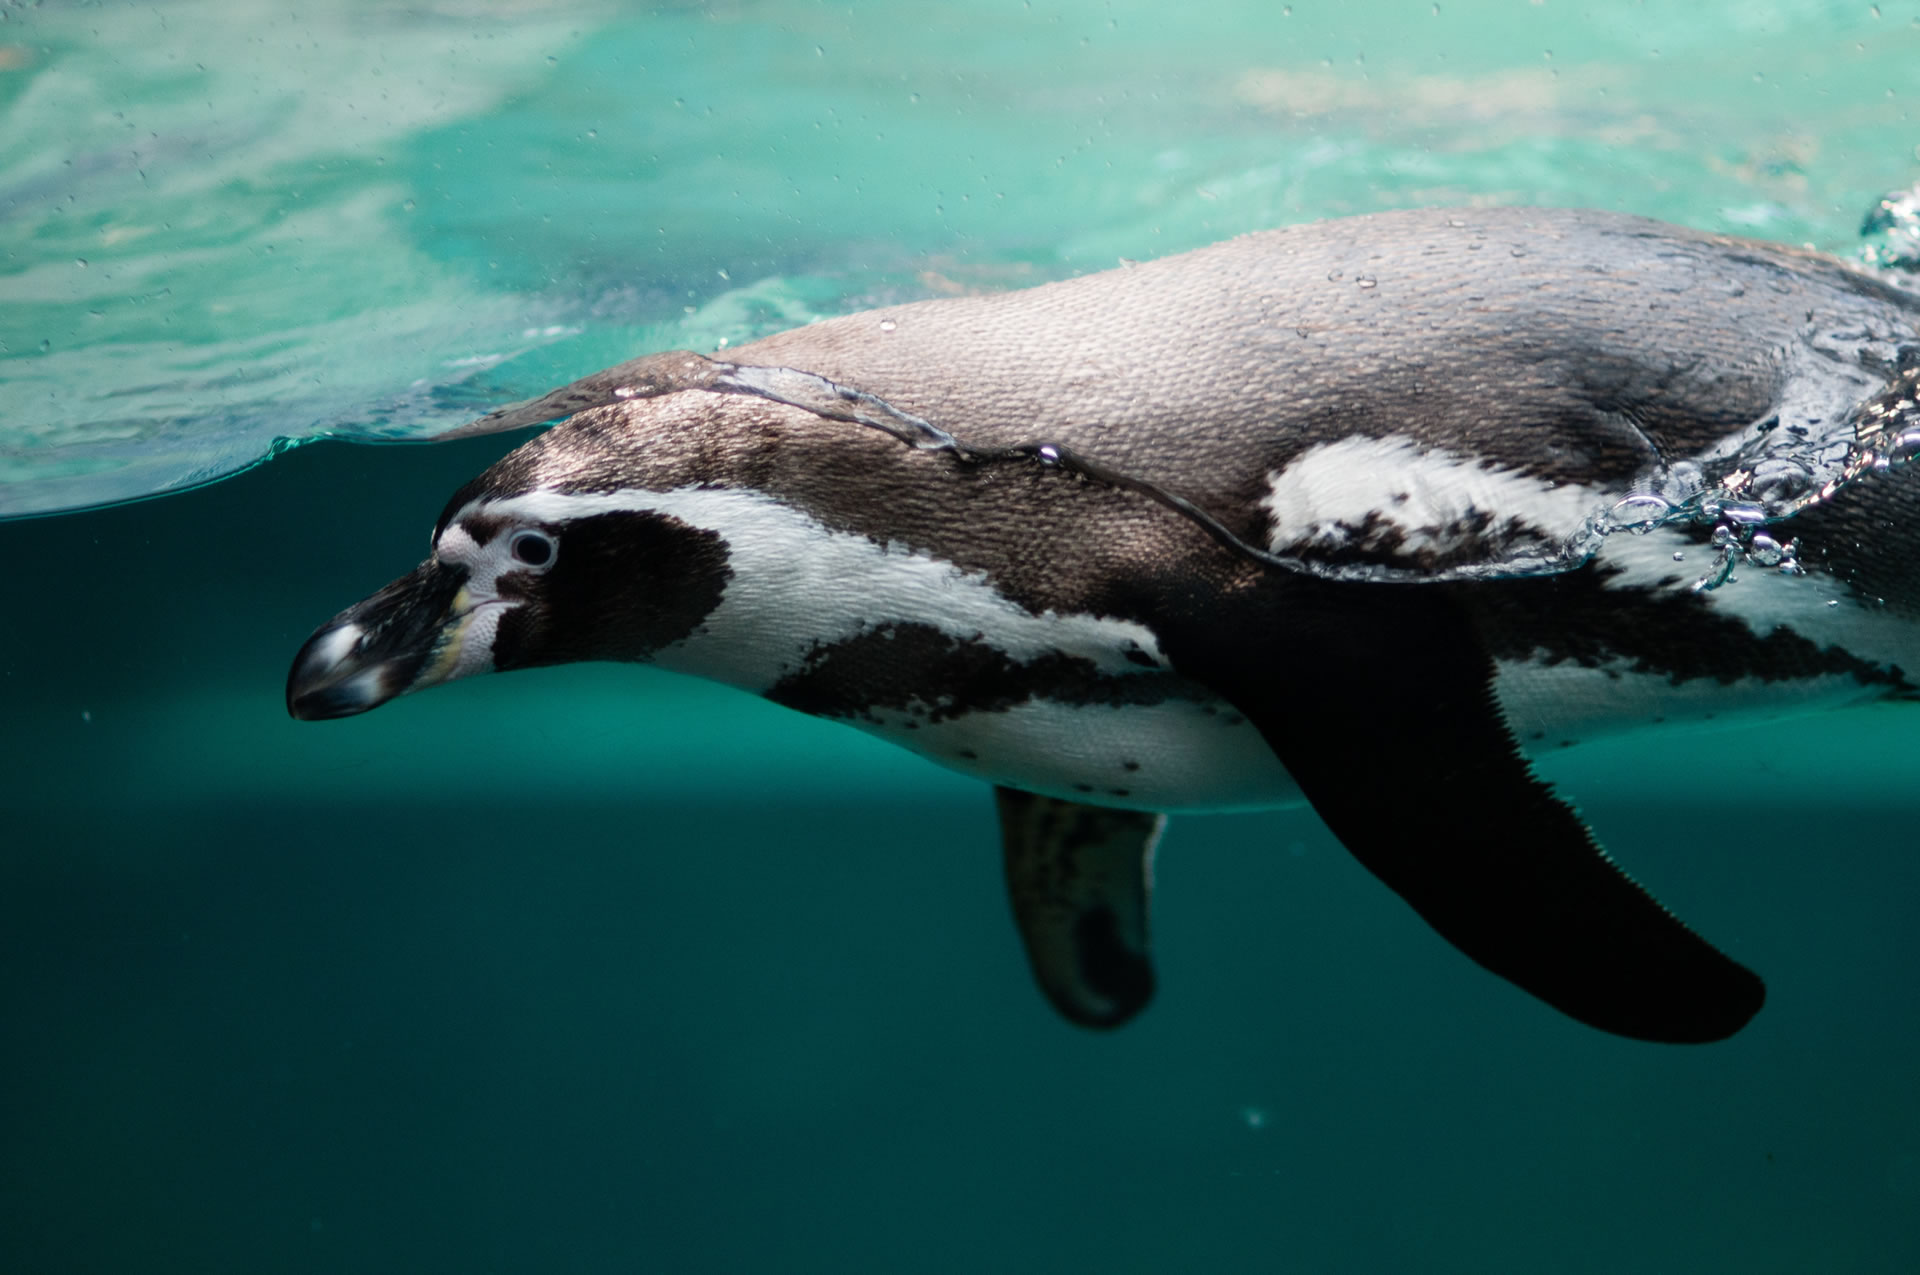 download wallpaper: pinguin wallpaper